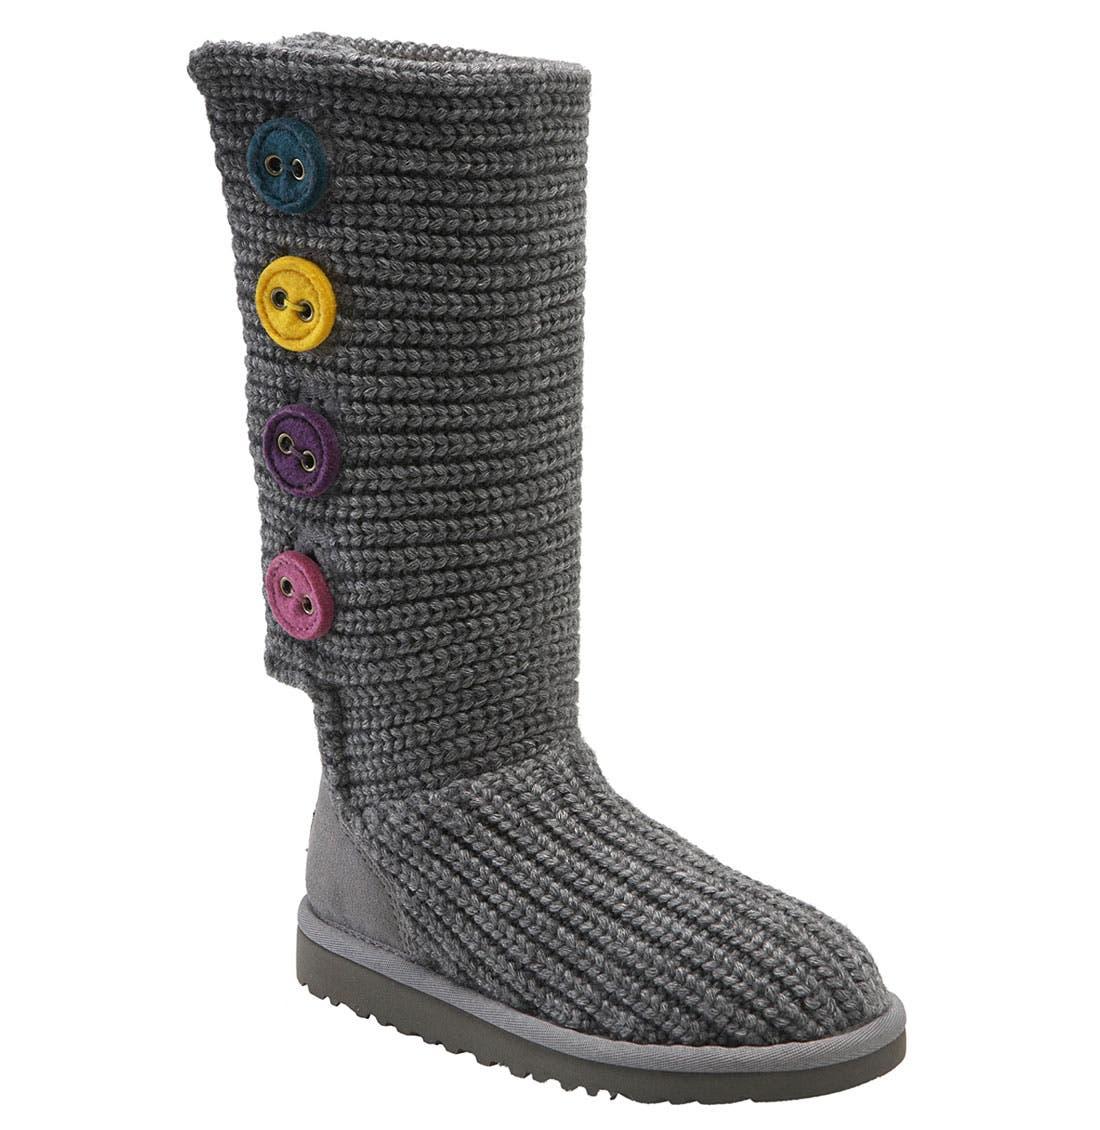 Main Image - UGG® Australia 'Cardy II' Crochet Boot (Toddler, Little Kid & Big Kid)